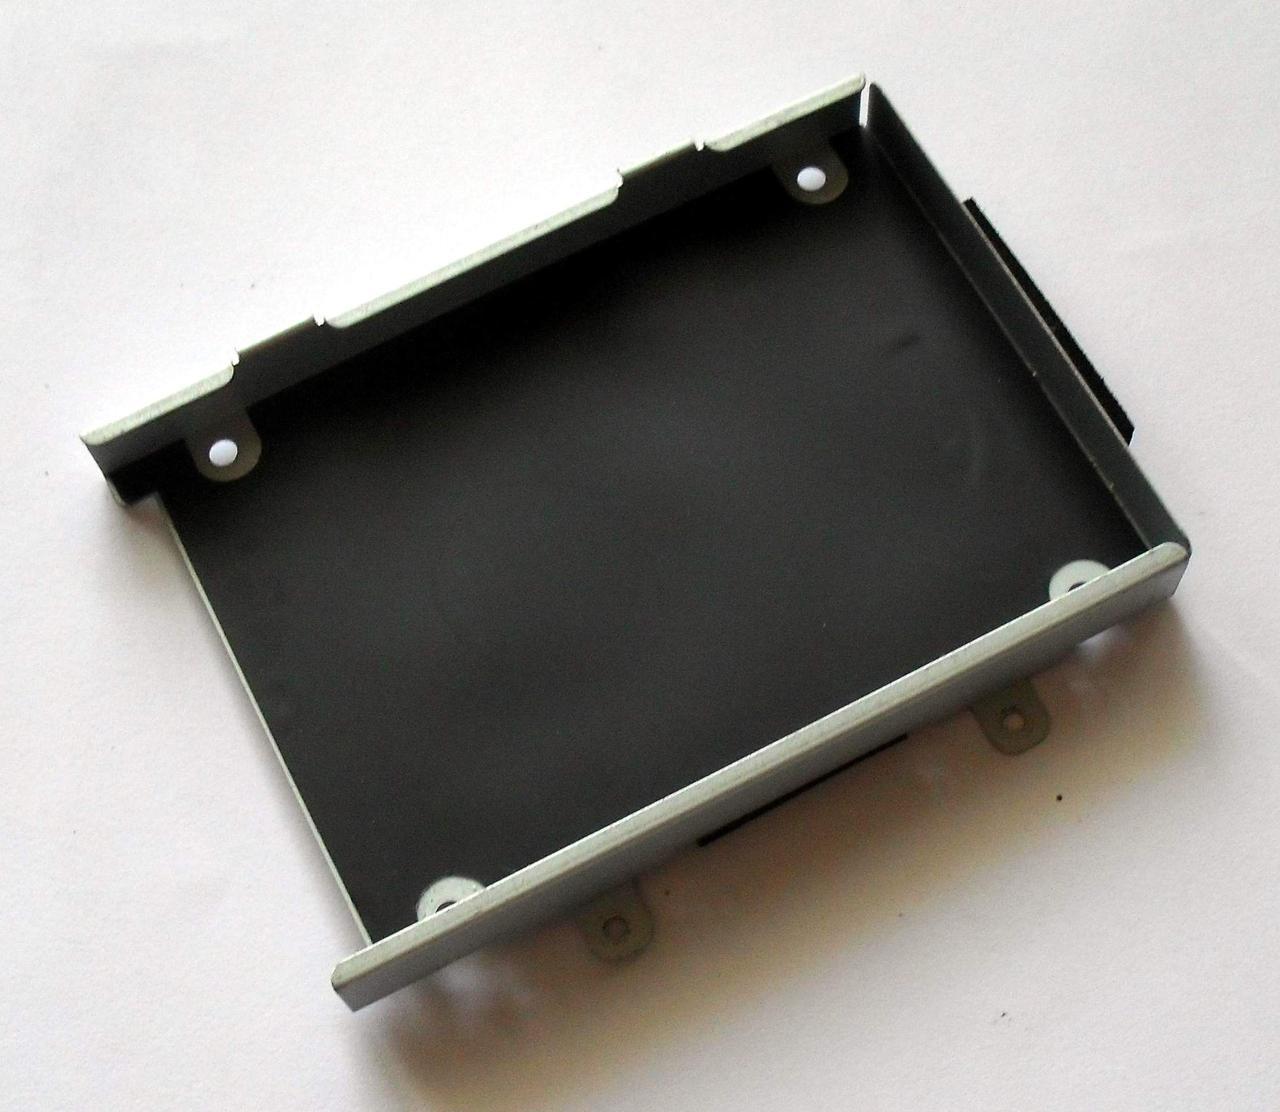 330 Корзина HDD Asus X51 X51RL X51R X51L X51H X58 X58C X58L - 13GNKC3AM10X-1